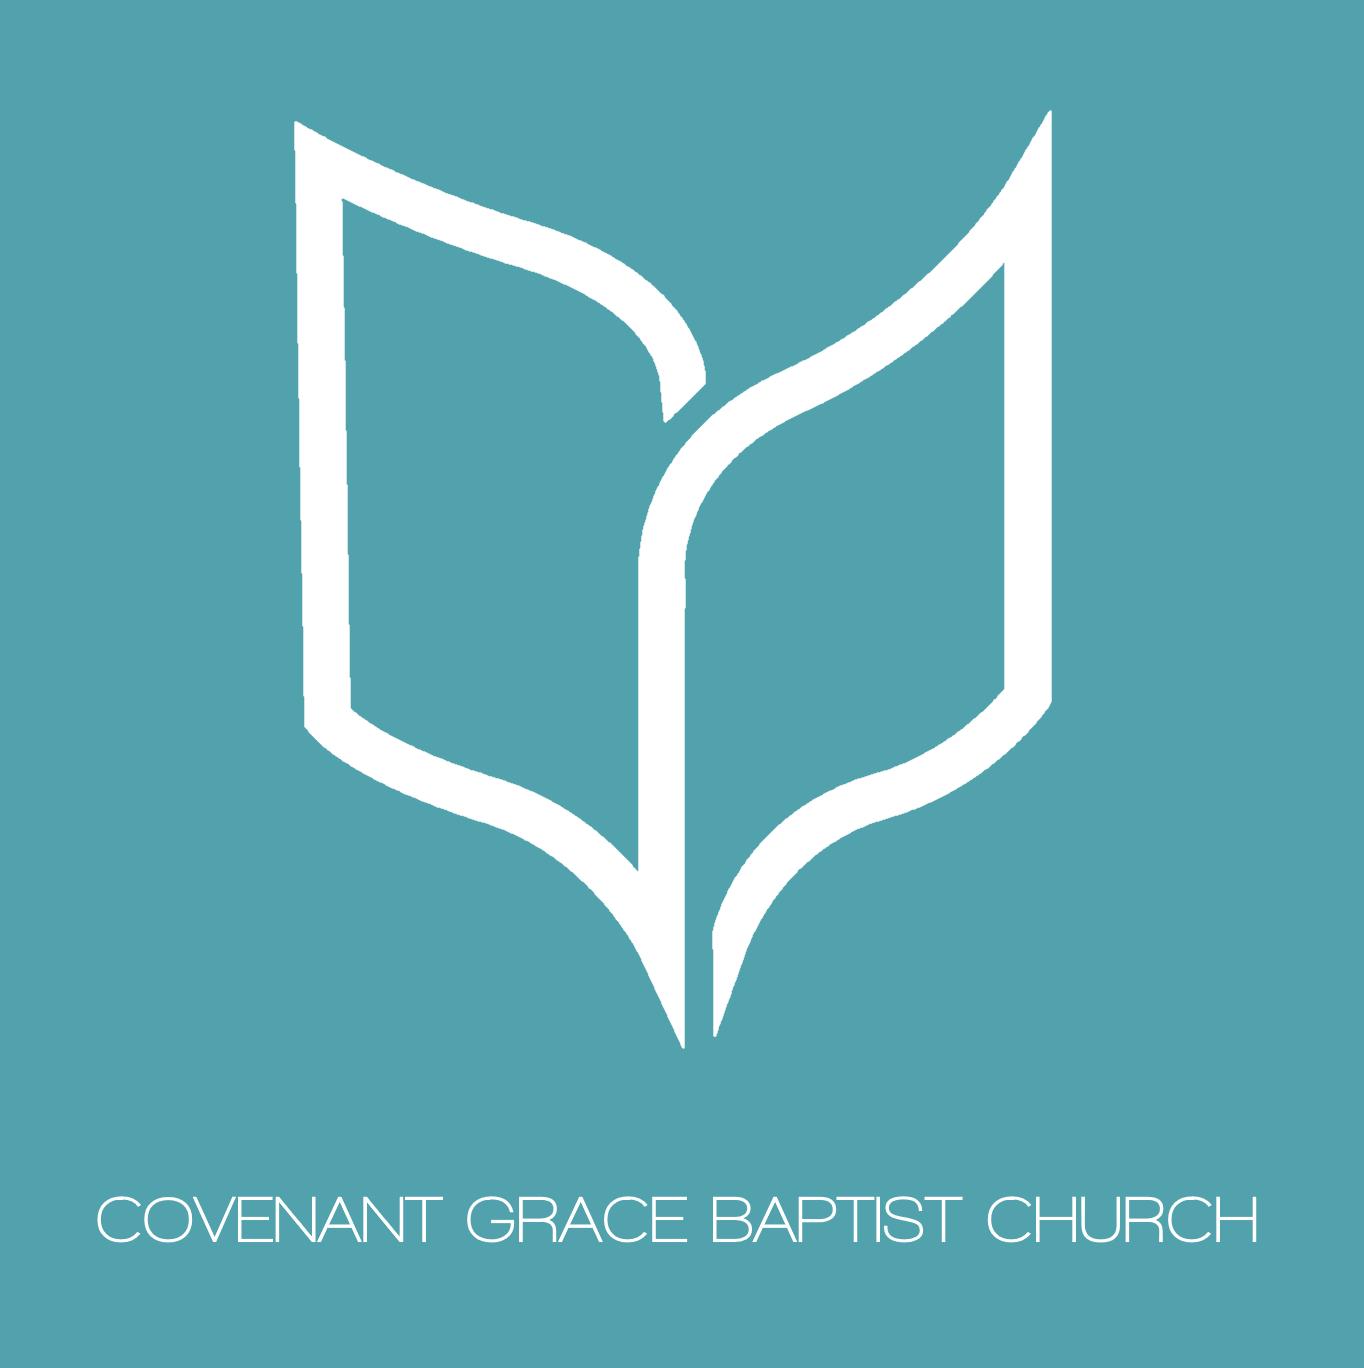 Covenant Grace Baptist Church logo